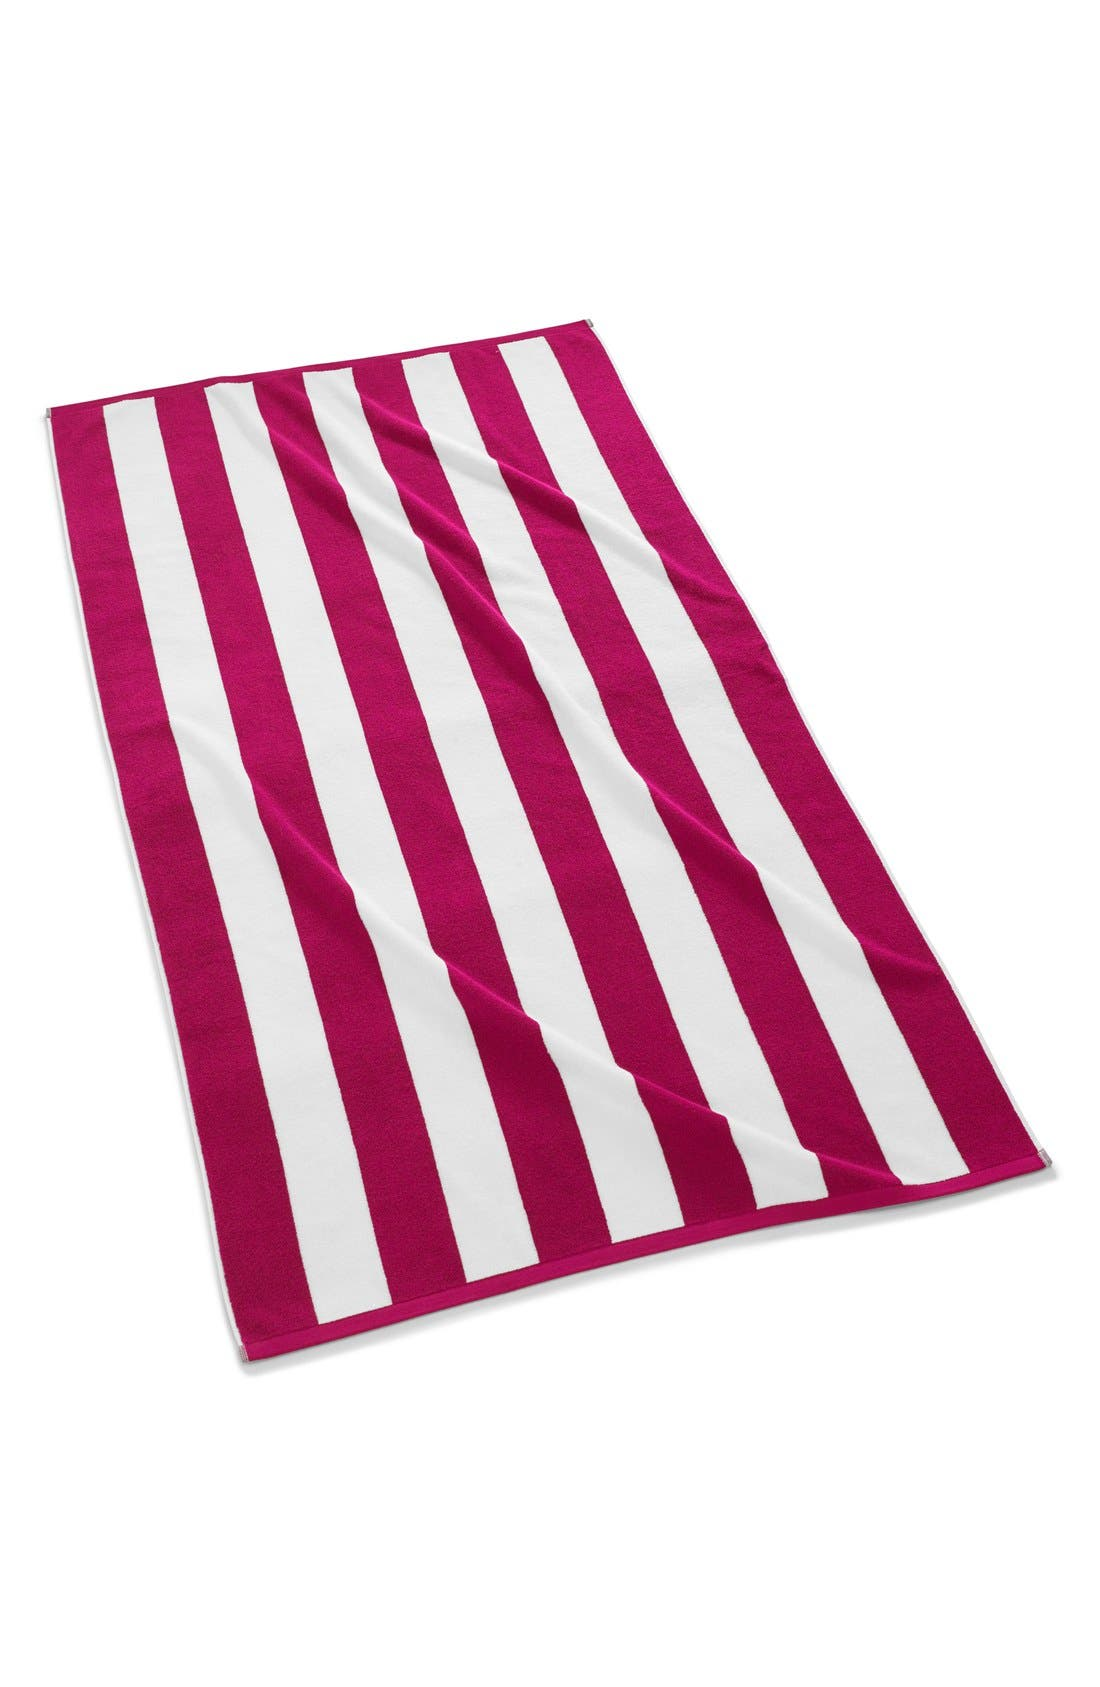 KASSATEX 'Cabana' Stripe Beach Towel